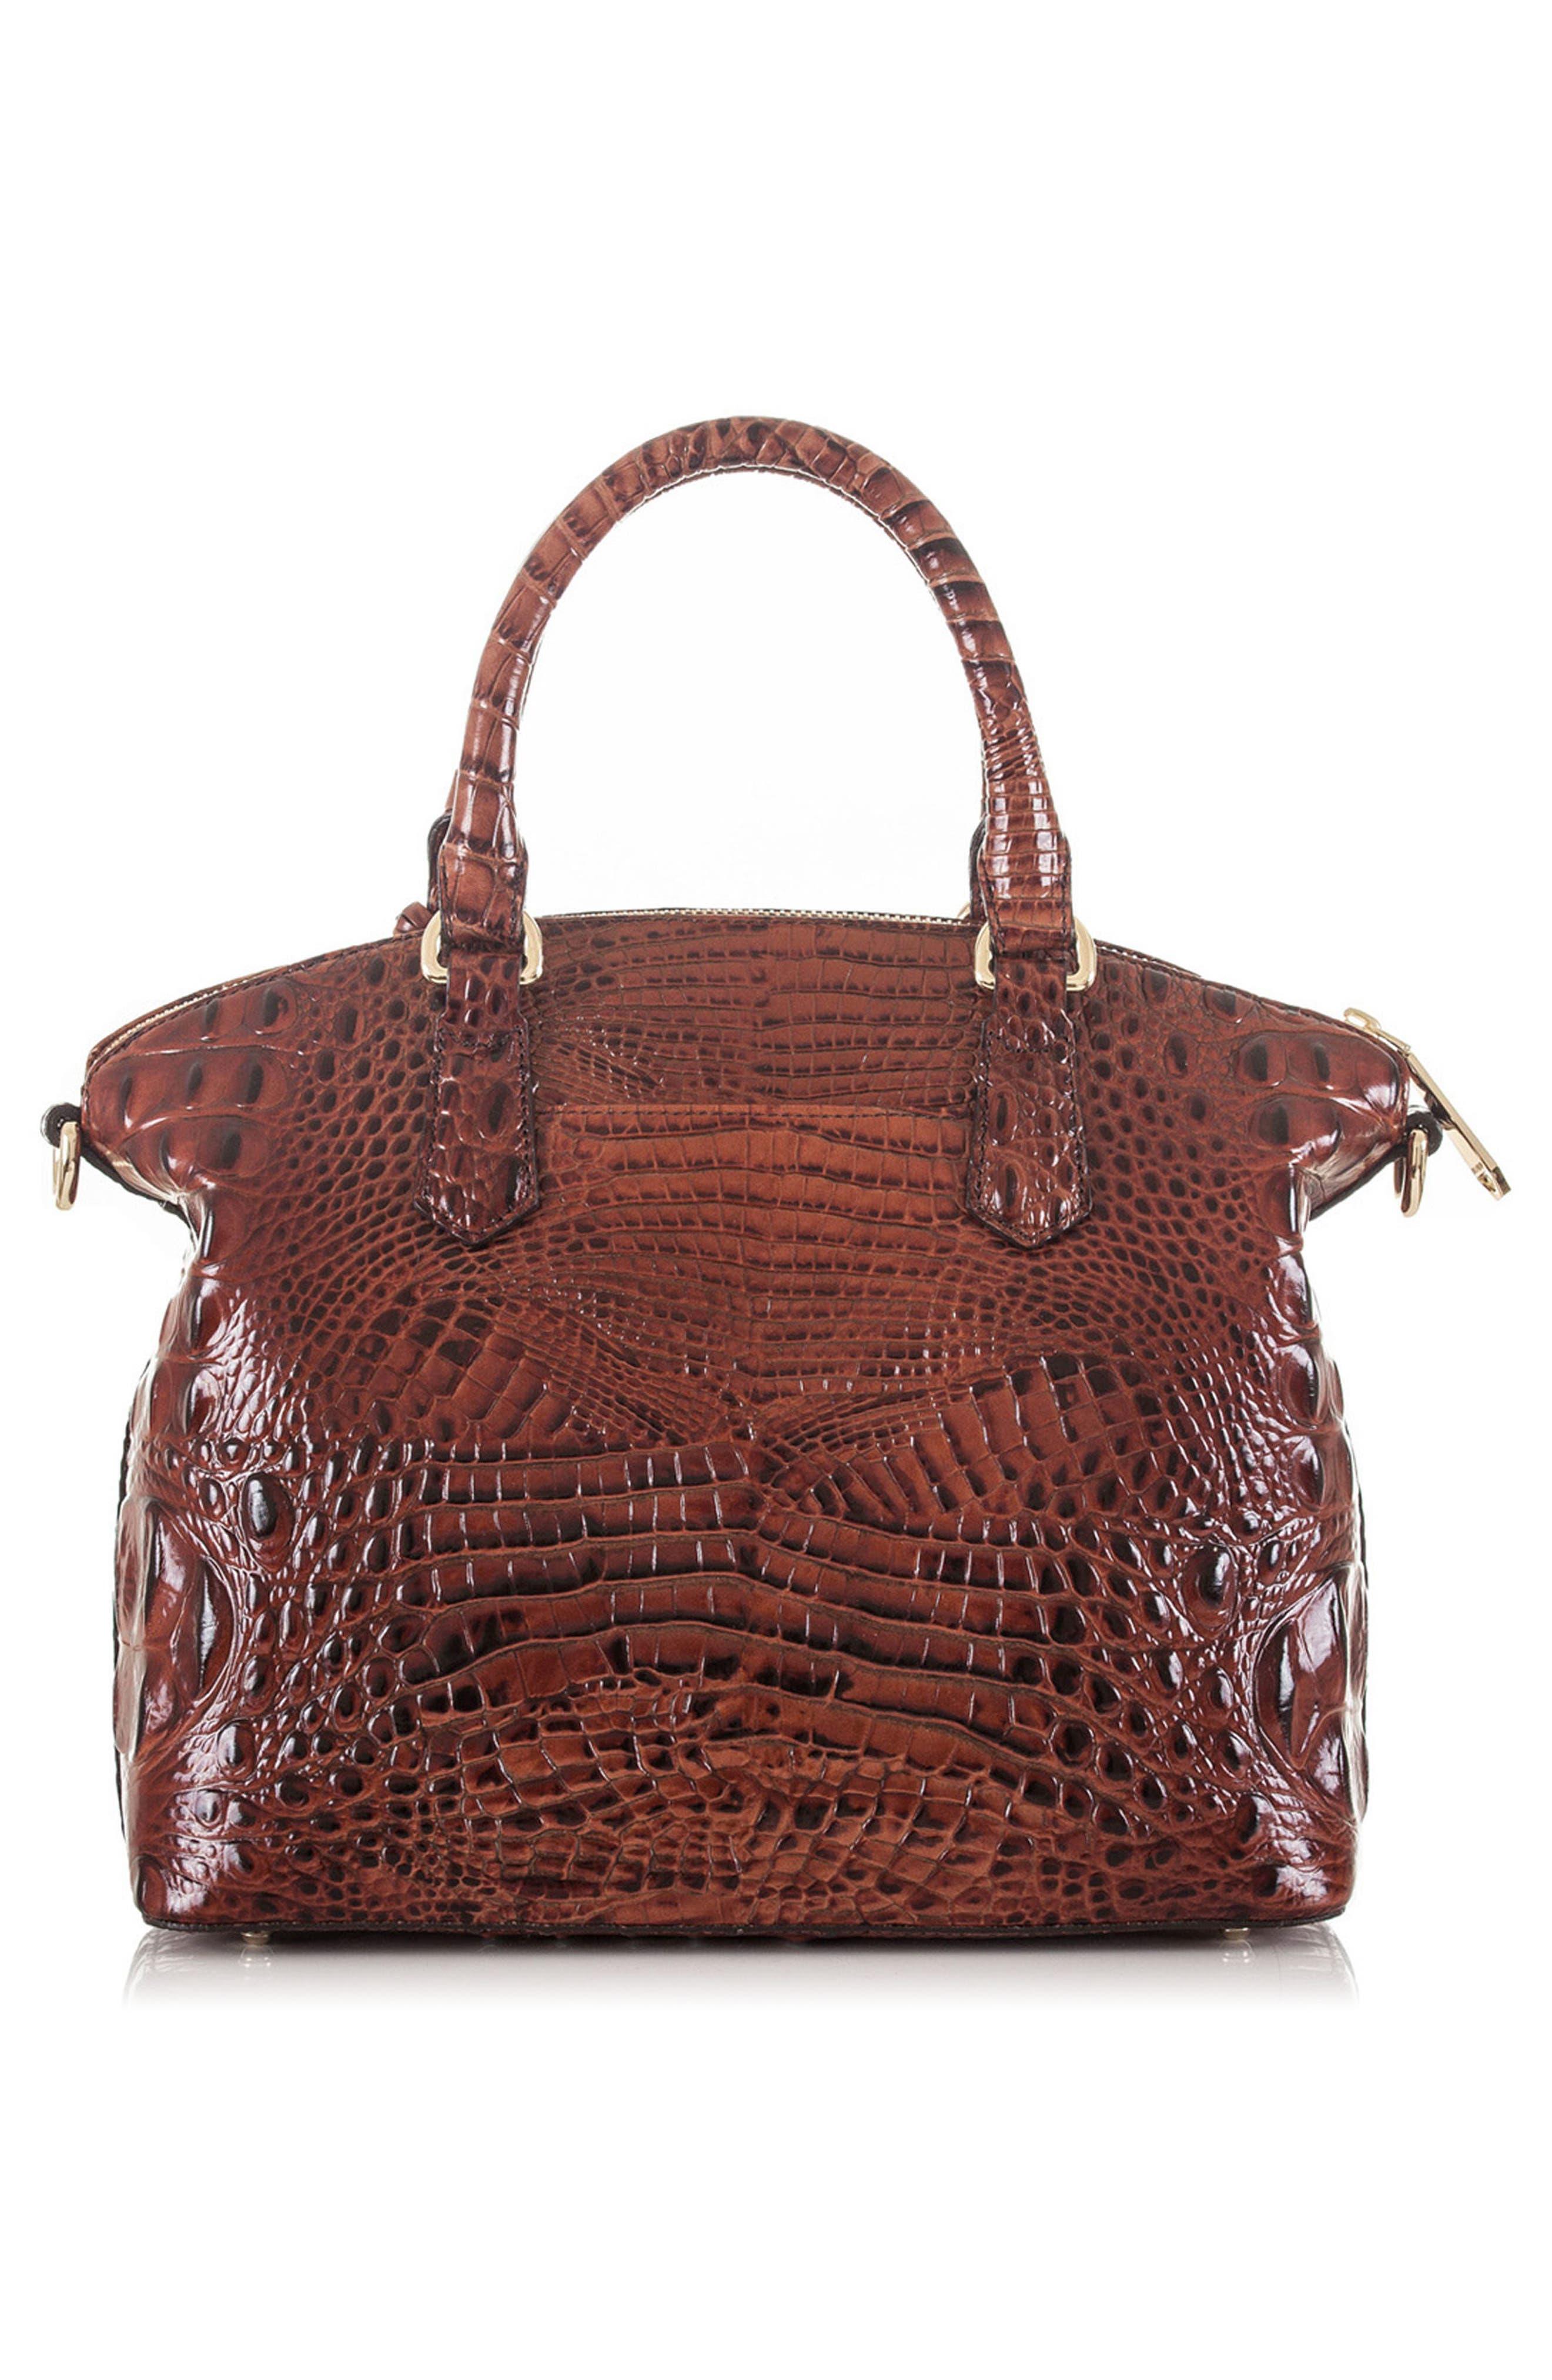 BRAHMIN, 'Medium Duxbury' Croc Embossed Leather Satchel, Alternate thumbnail 2, color, PECAN